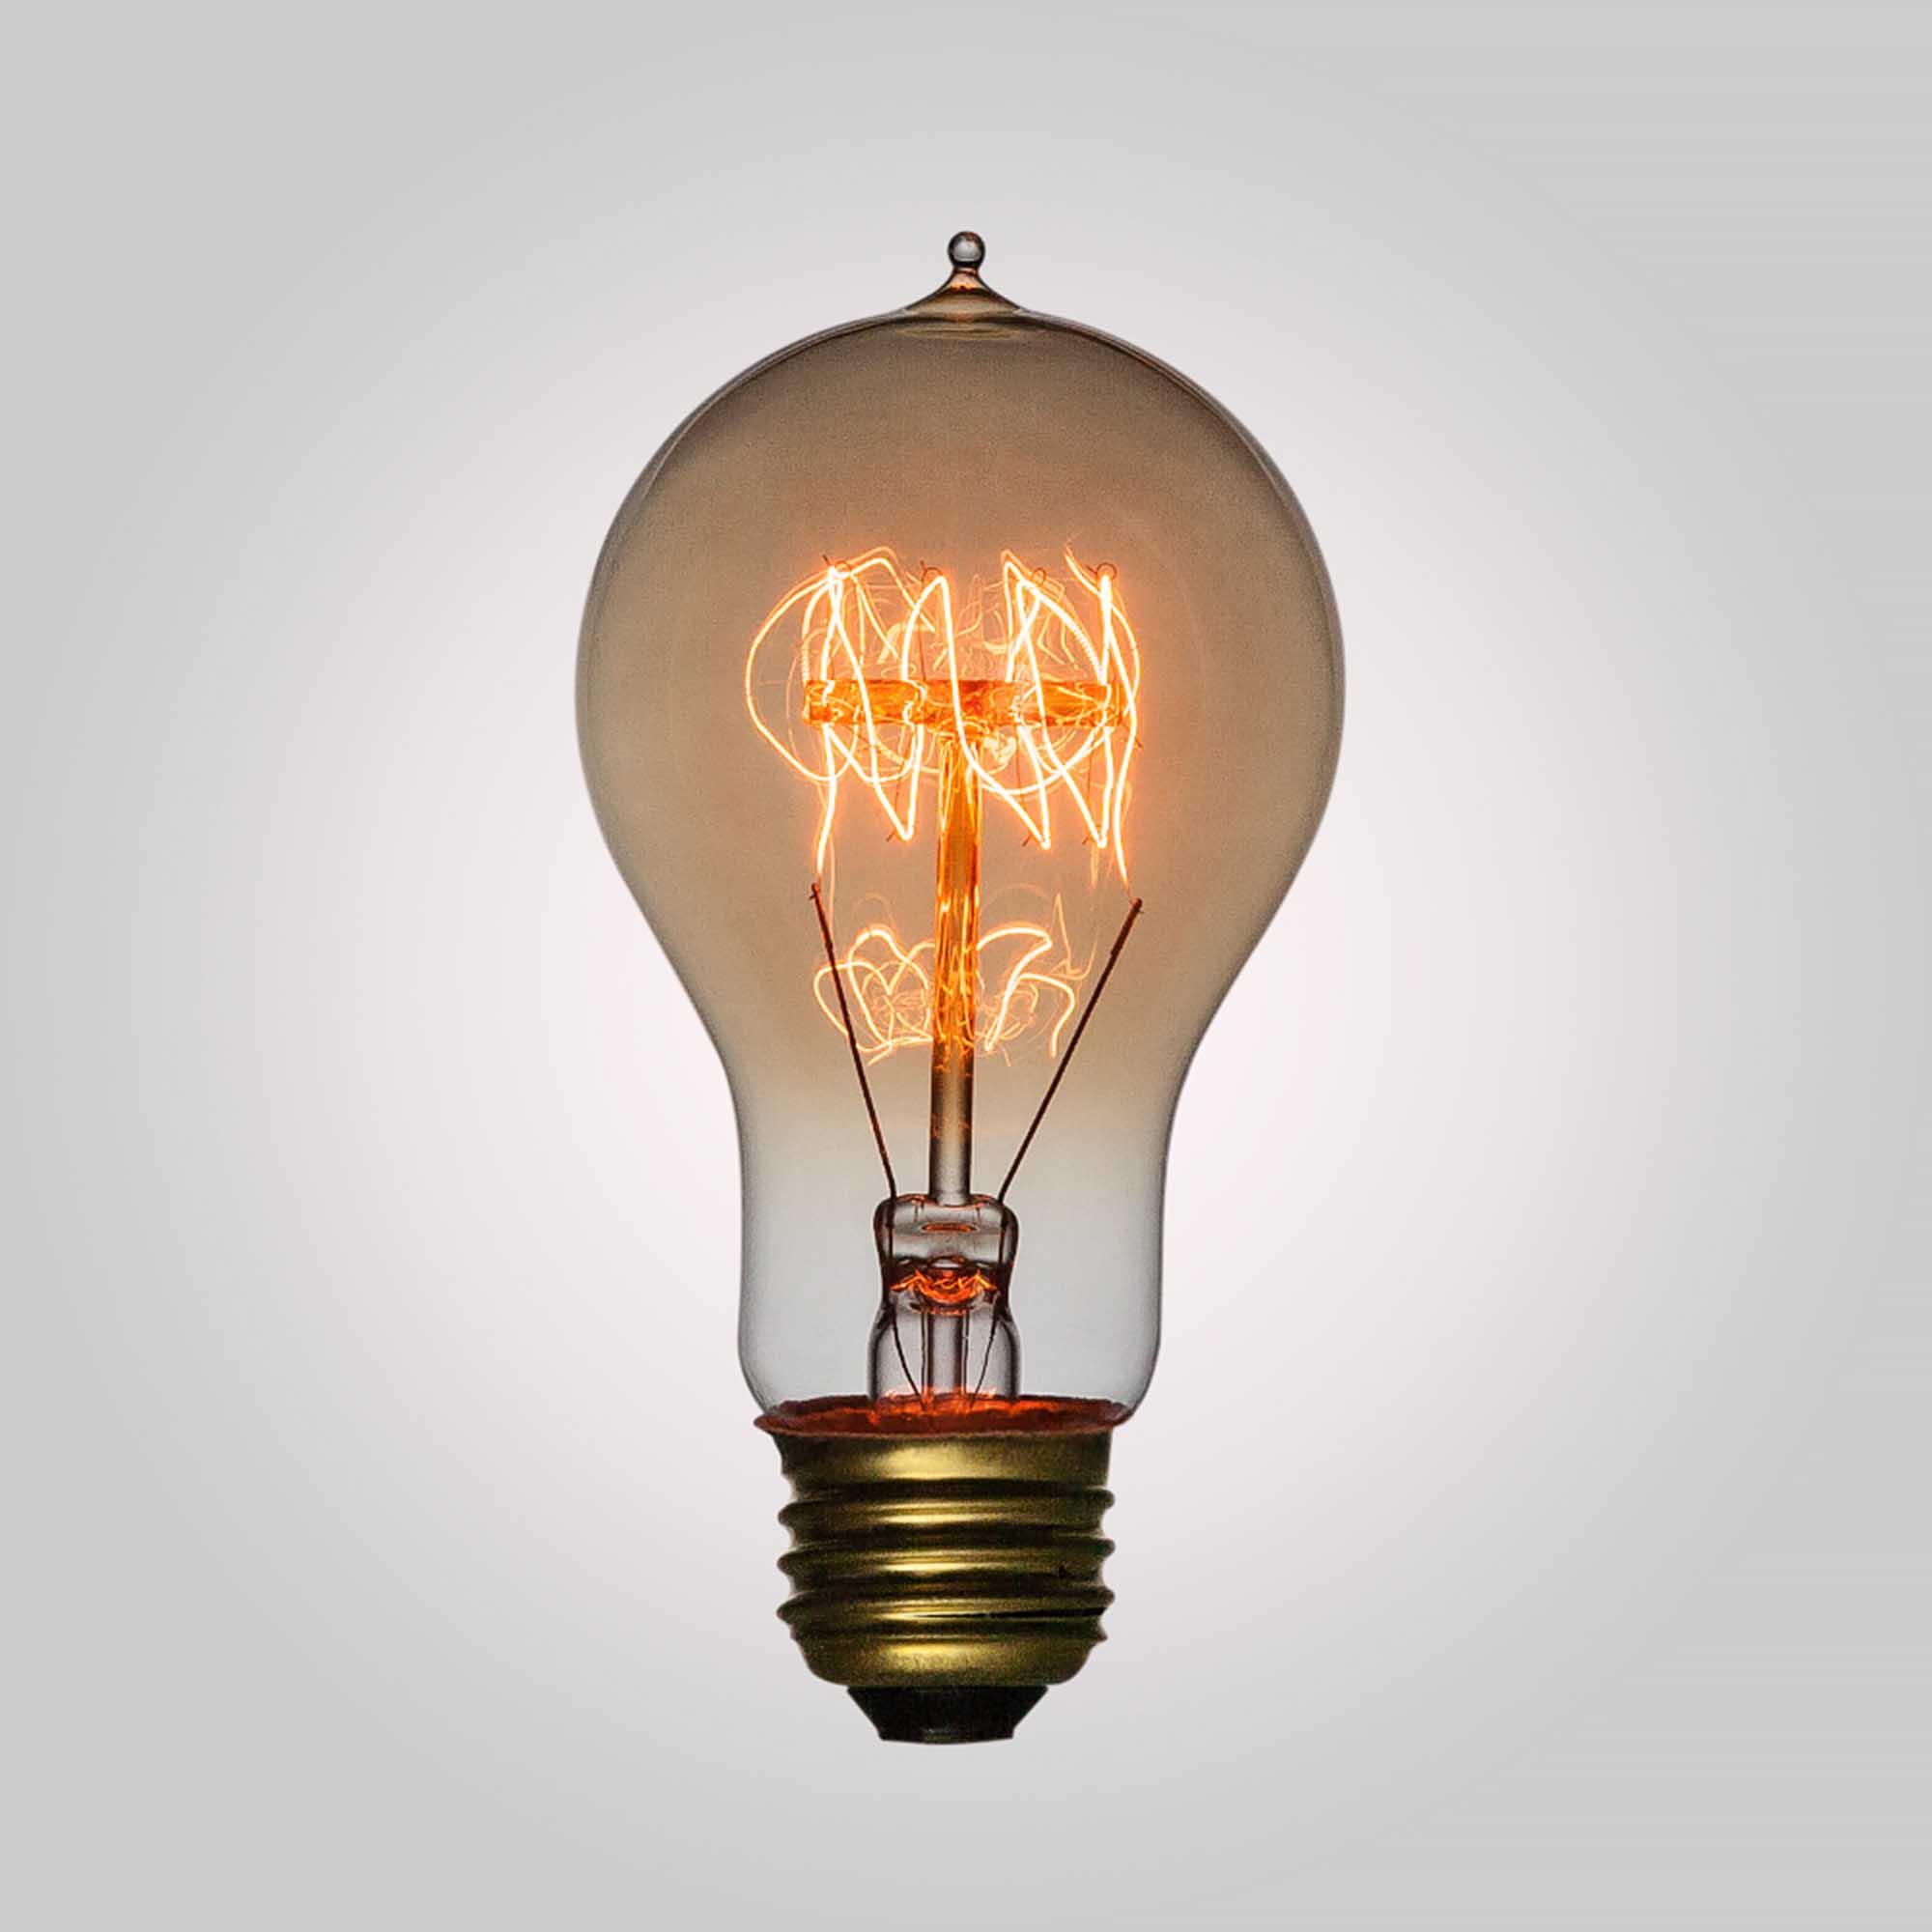 Filament A19 Vintage Edison Light Bulb, Quad-Loop Antique Hanging Light, E27 Base, Set of 2